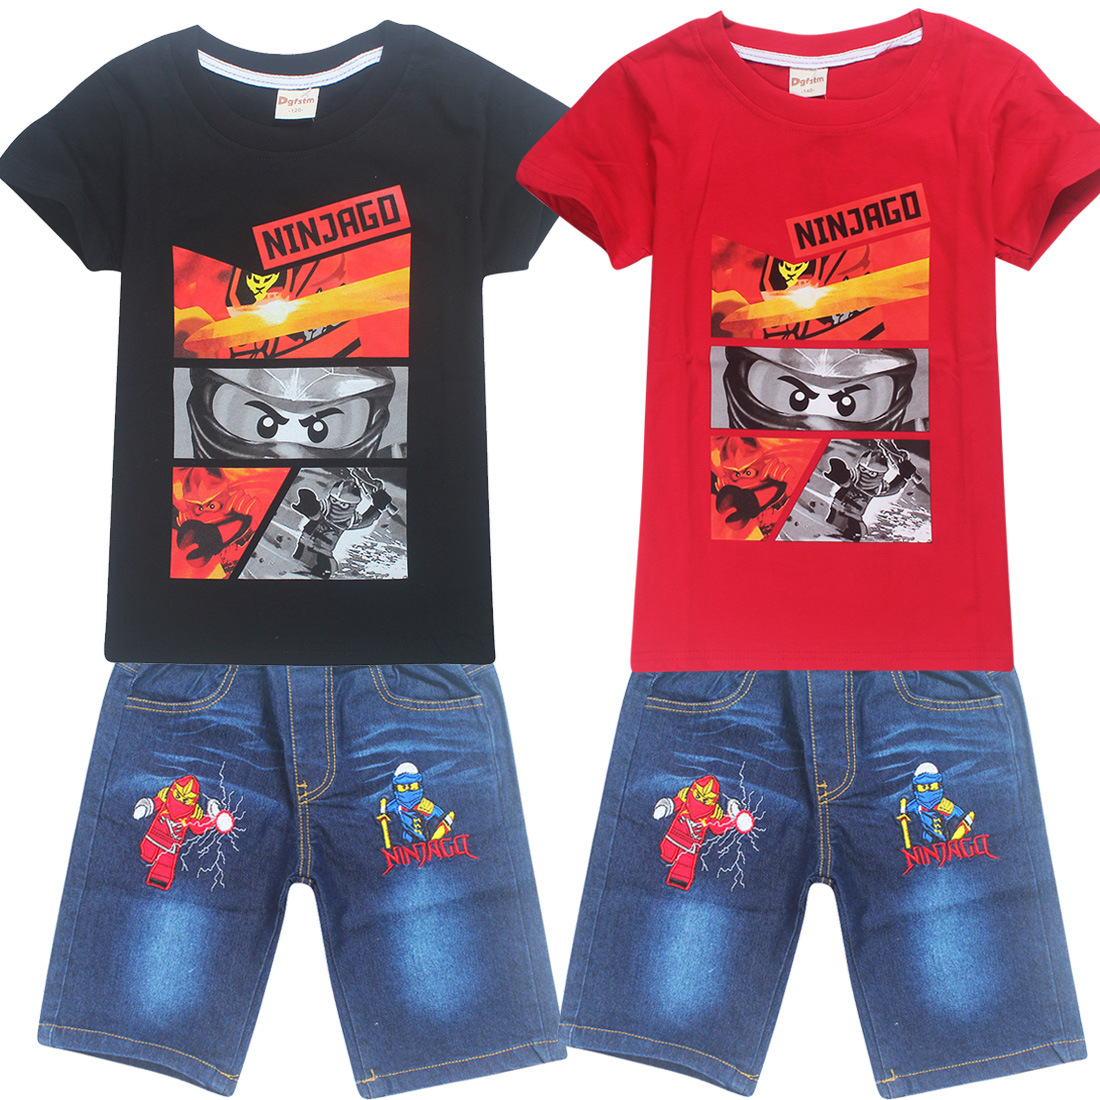 Boys Kids Lego Ninjago Batman Short Sleeve Pyjamas Set Pjs T-Shirt Shorts 3-10ys